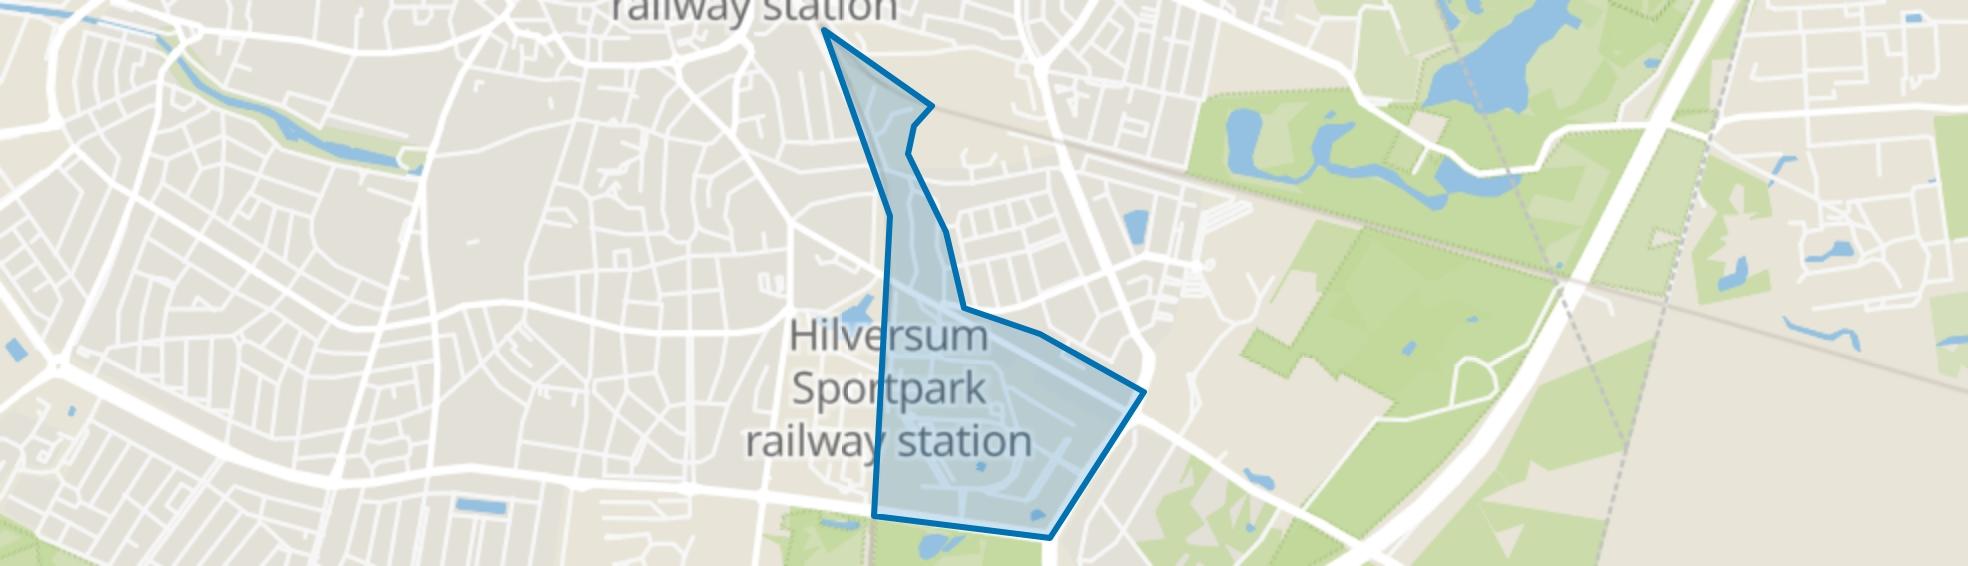 Arenaparkkwartier, Hilversum map